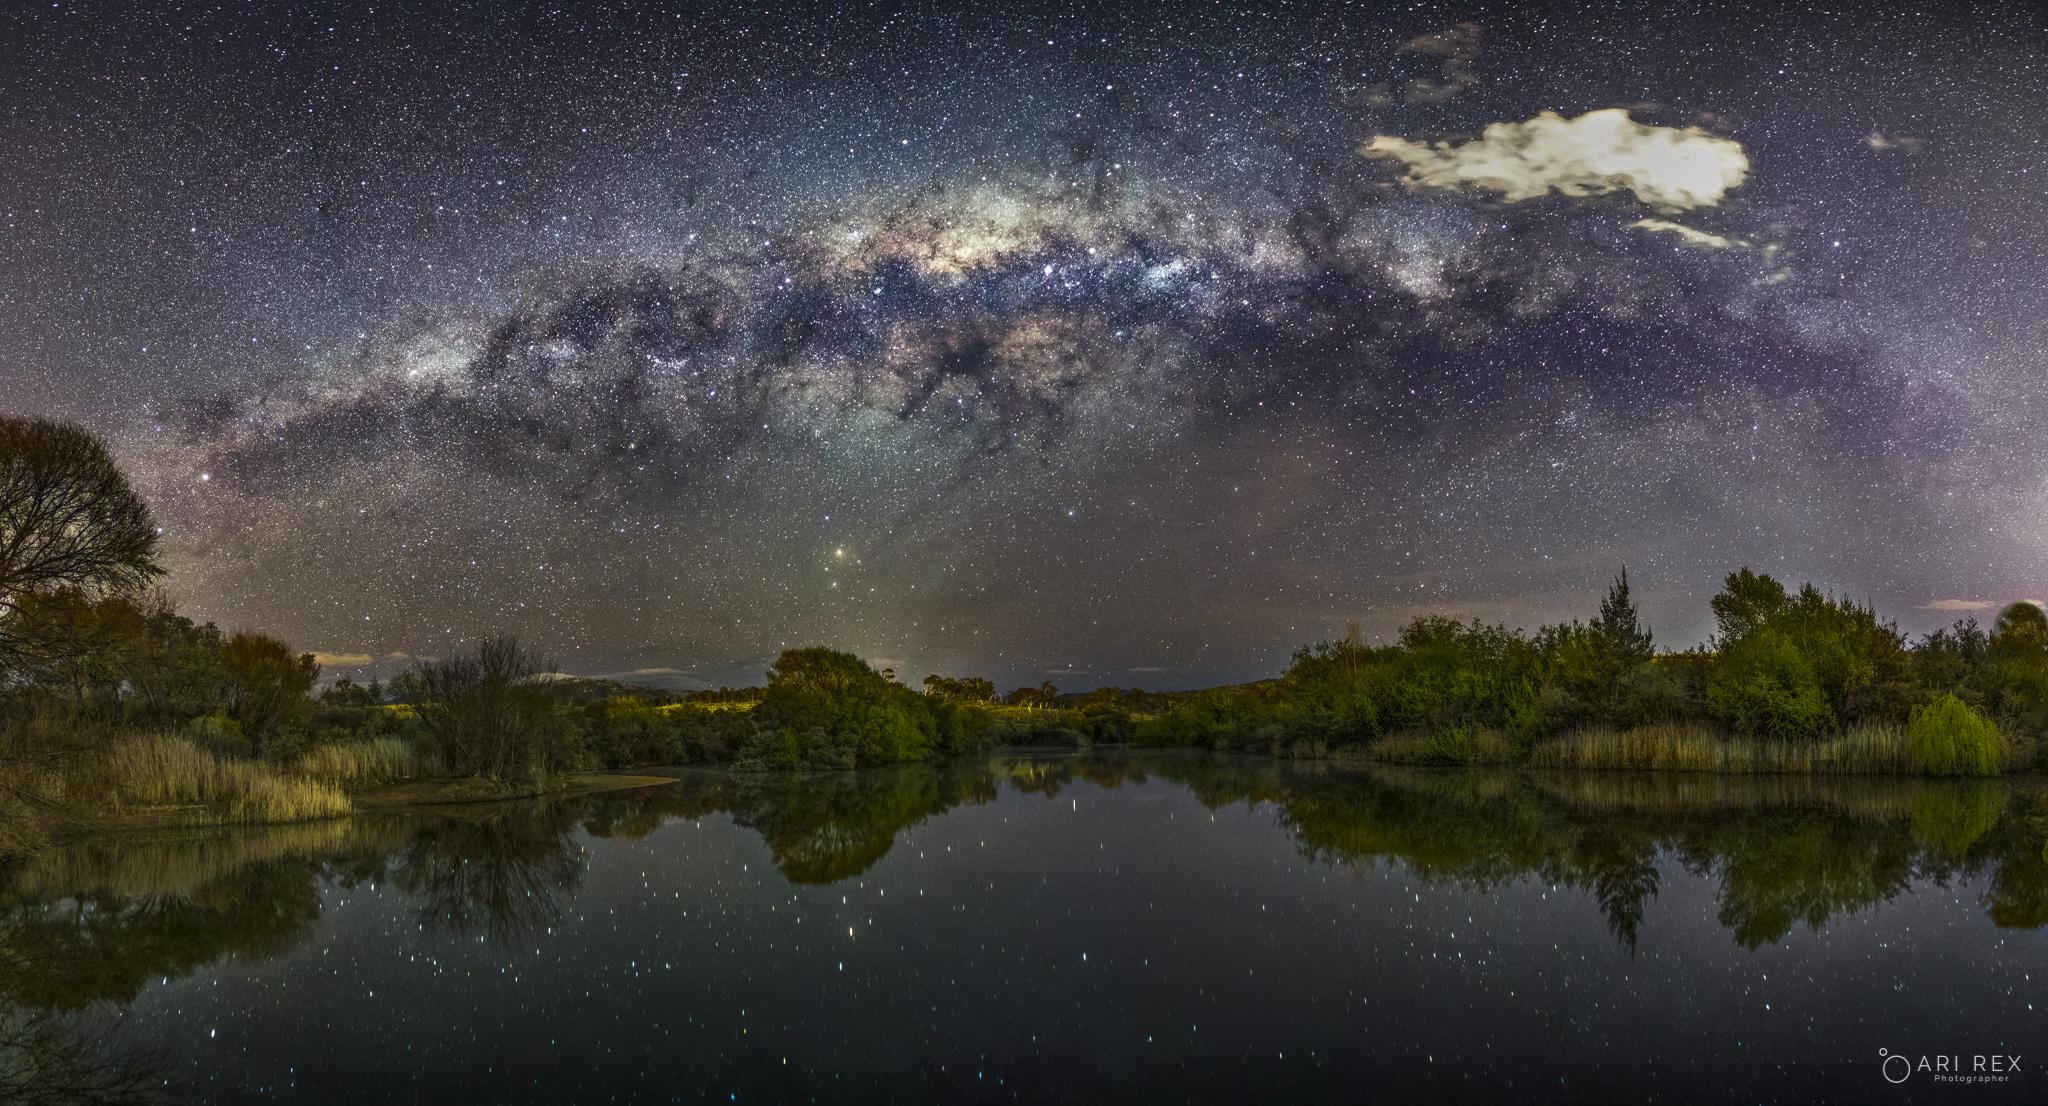 Gordon Canberra